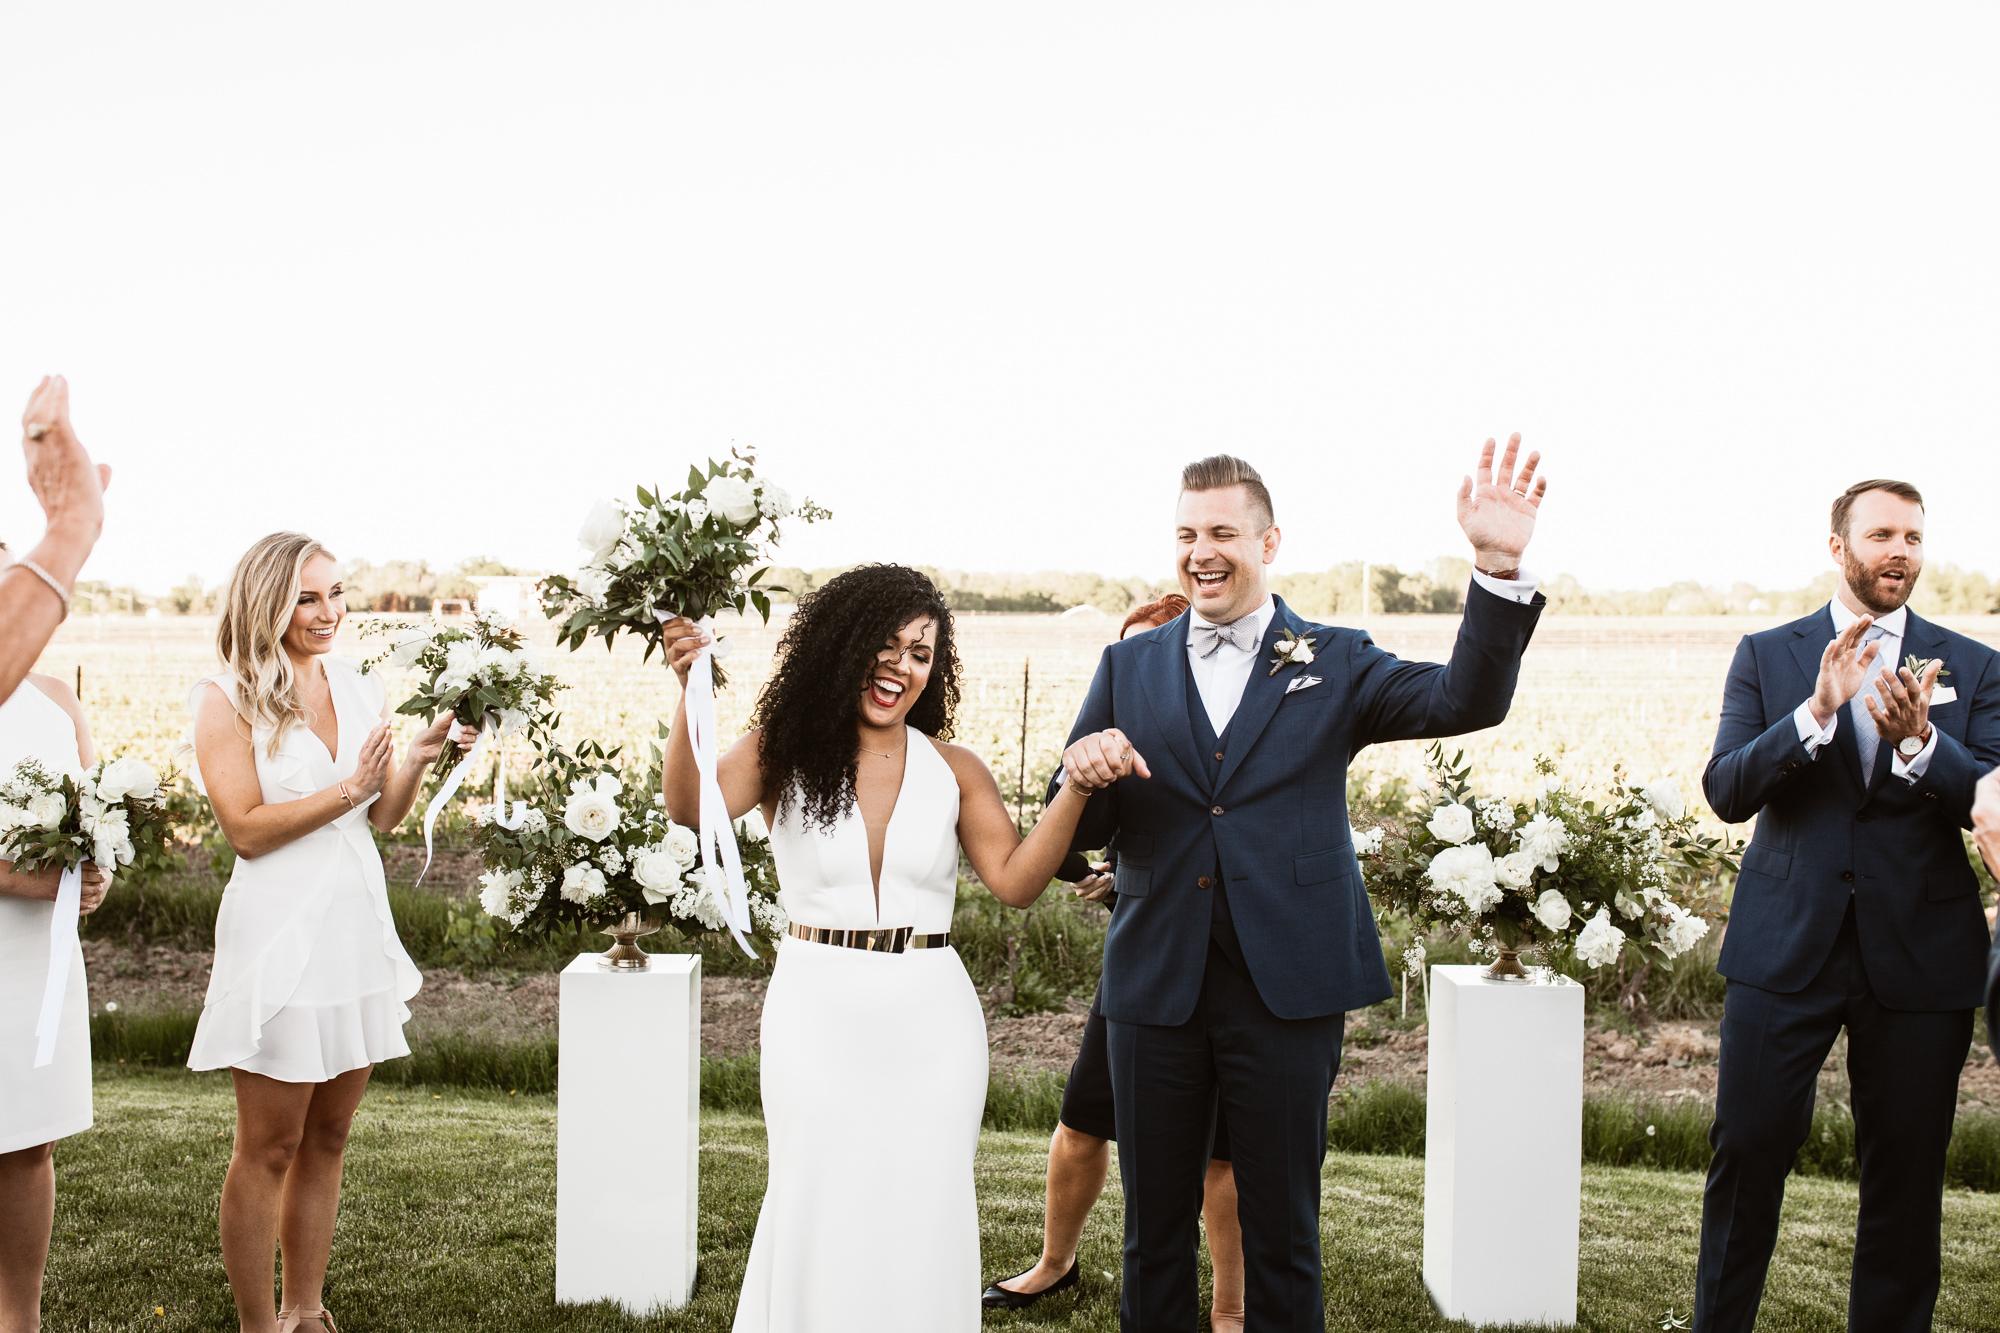 stratus-winery-wedding-vineyard-wedding-vineyard-bride-photo-by-reed-photography-044.jpg